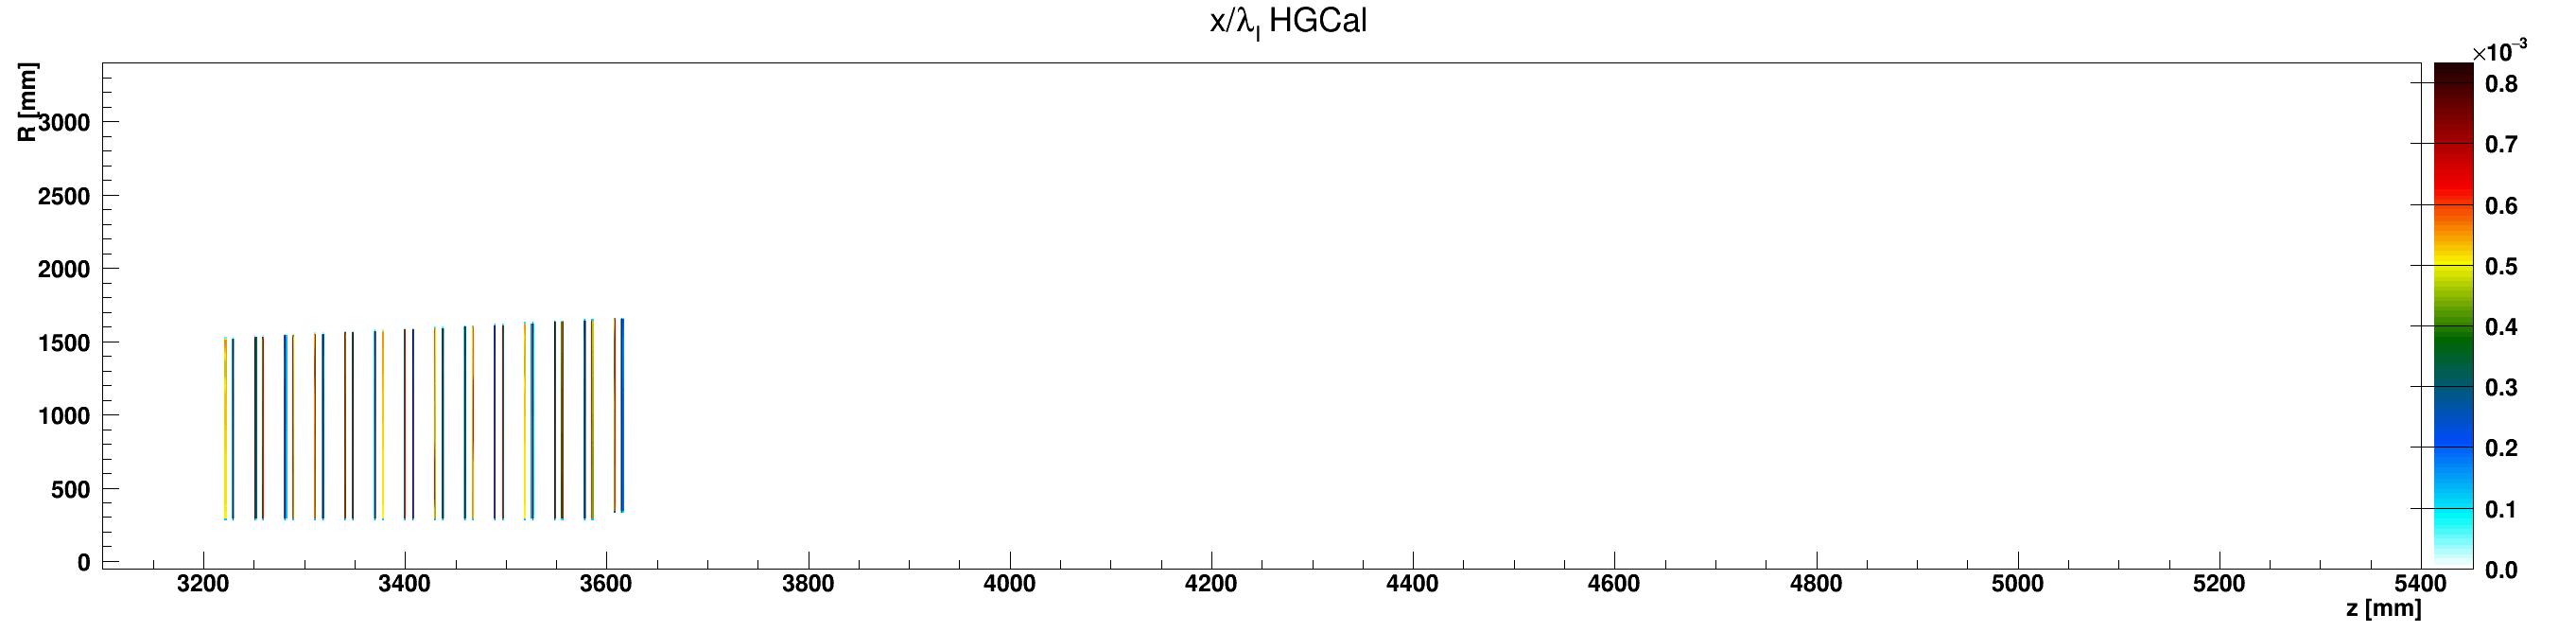 HGCal_l_vs_z_vs_RlocWCu_ZplusZoom.png